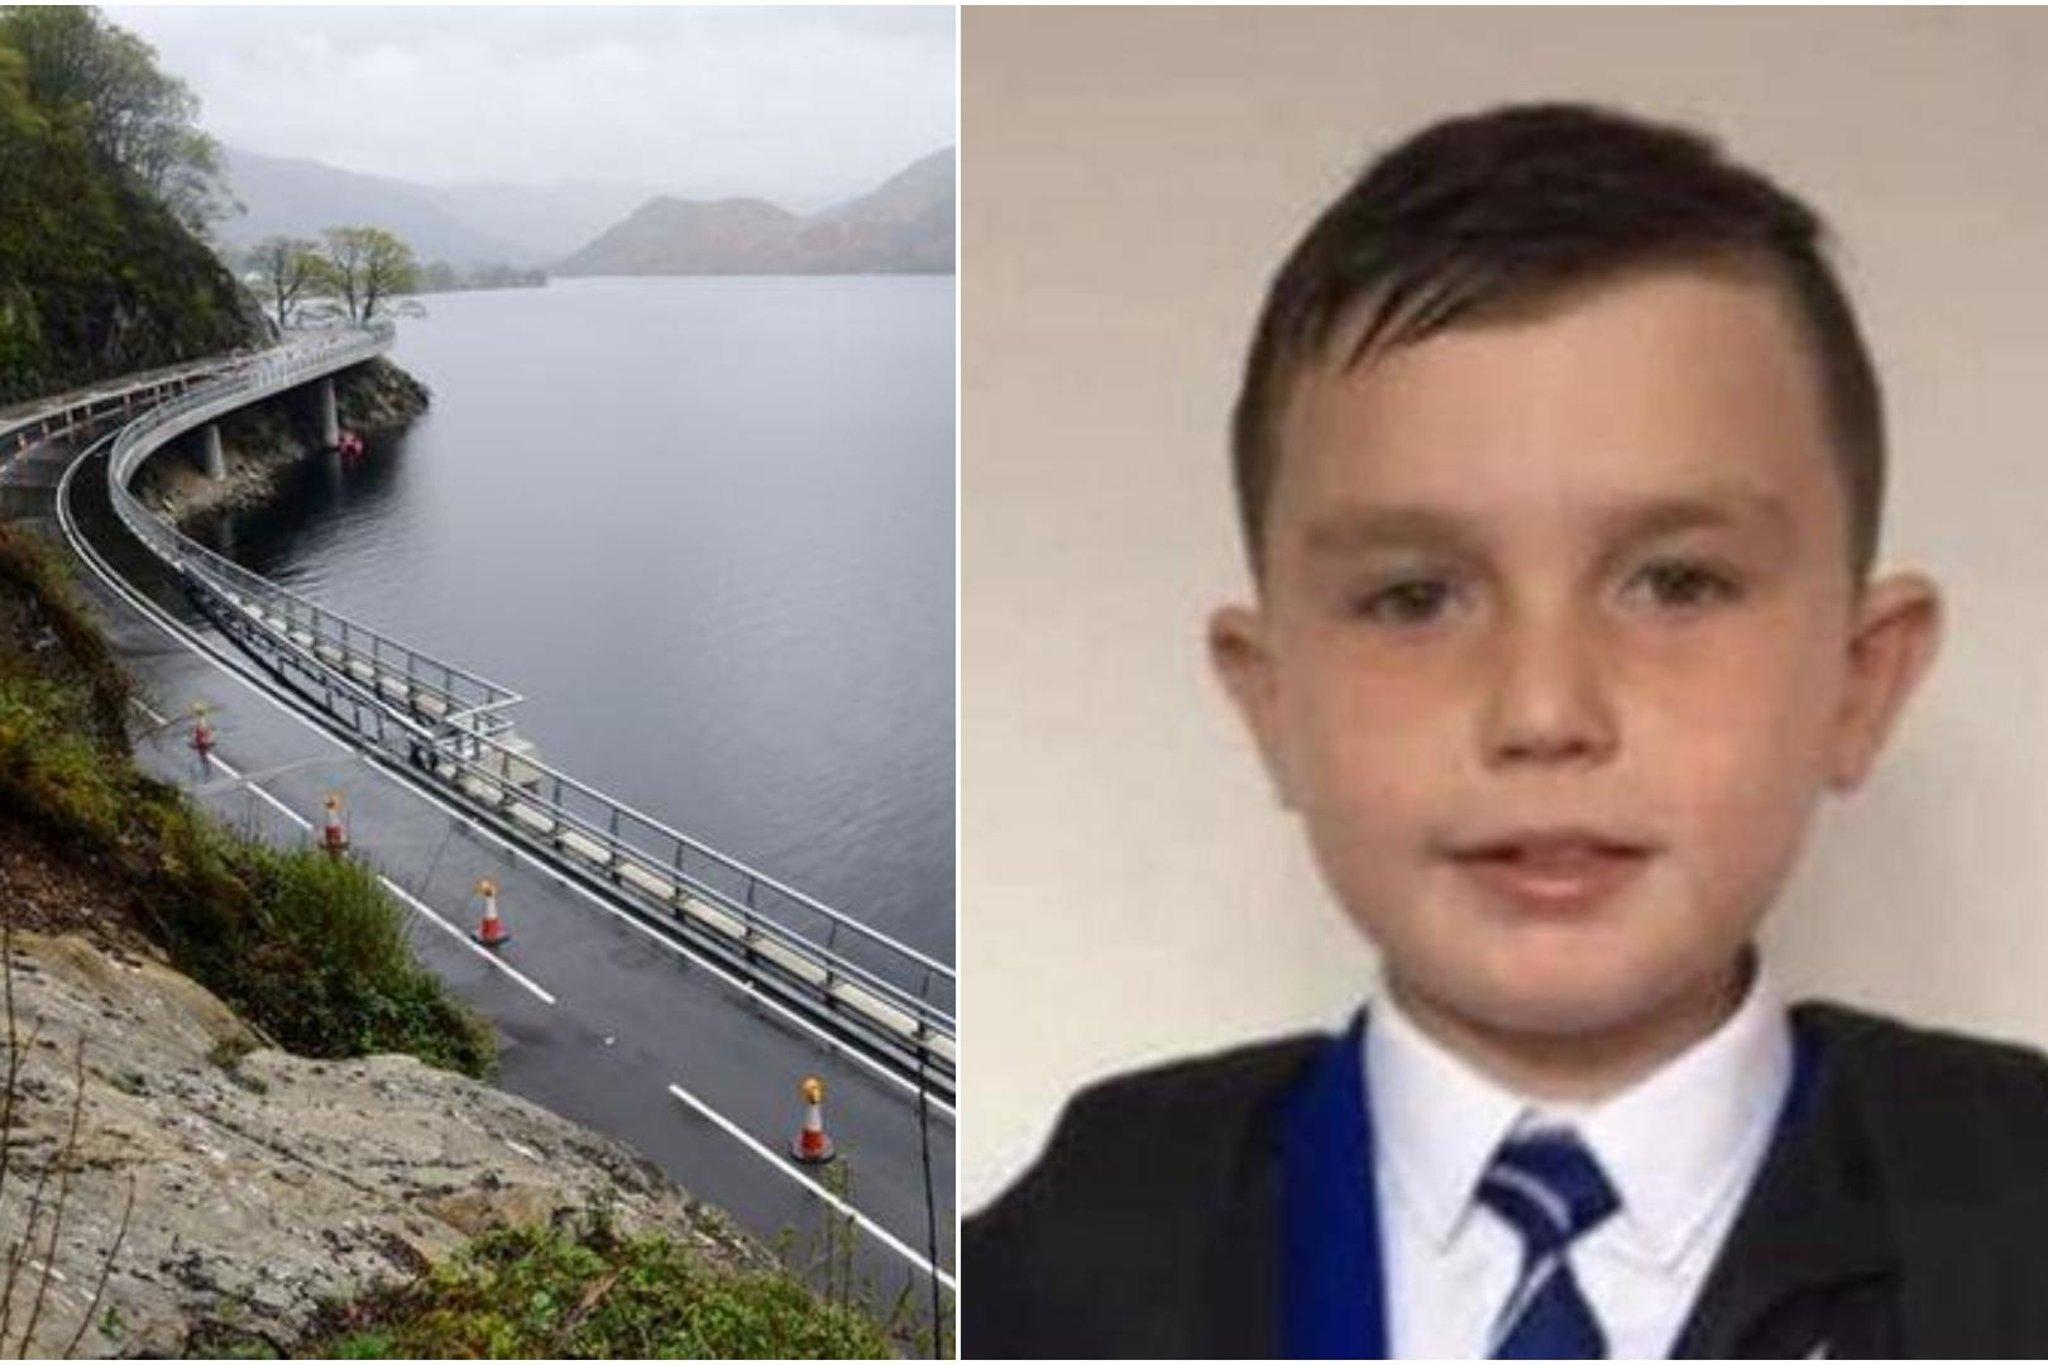 'Heartbreaking' Four boys among six drowning deaths on tragic weekend across Scotland